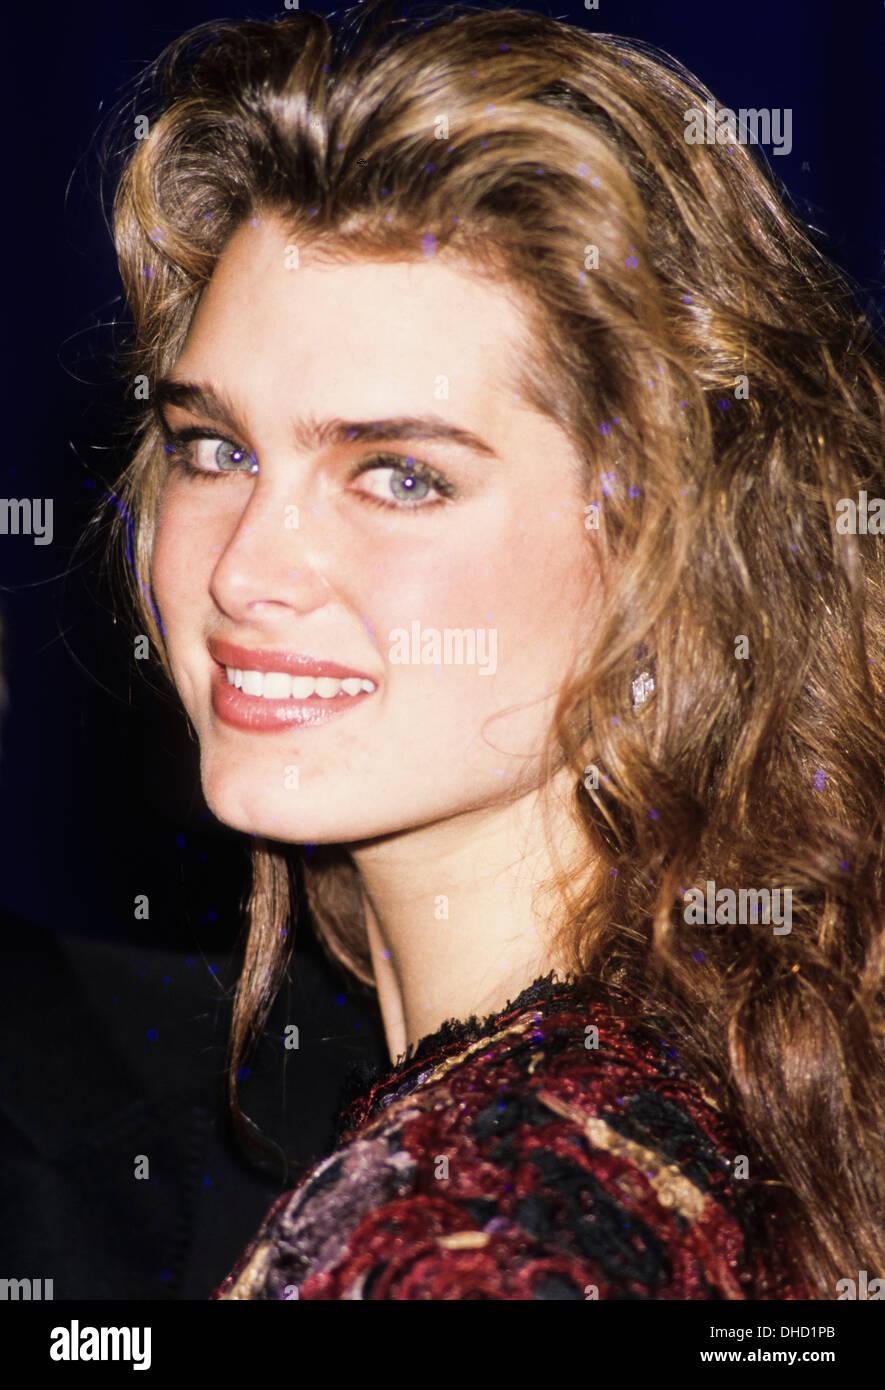 Cameron Bancroft,Ingrid Seynhaeve BEL 3 1995, 1997, 2000 Erotic image Gigliola Cinquetti (born 1947),Emma Taylor-Isherwood